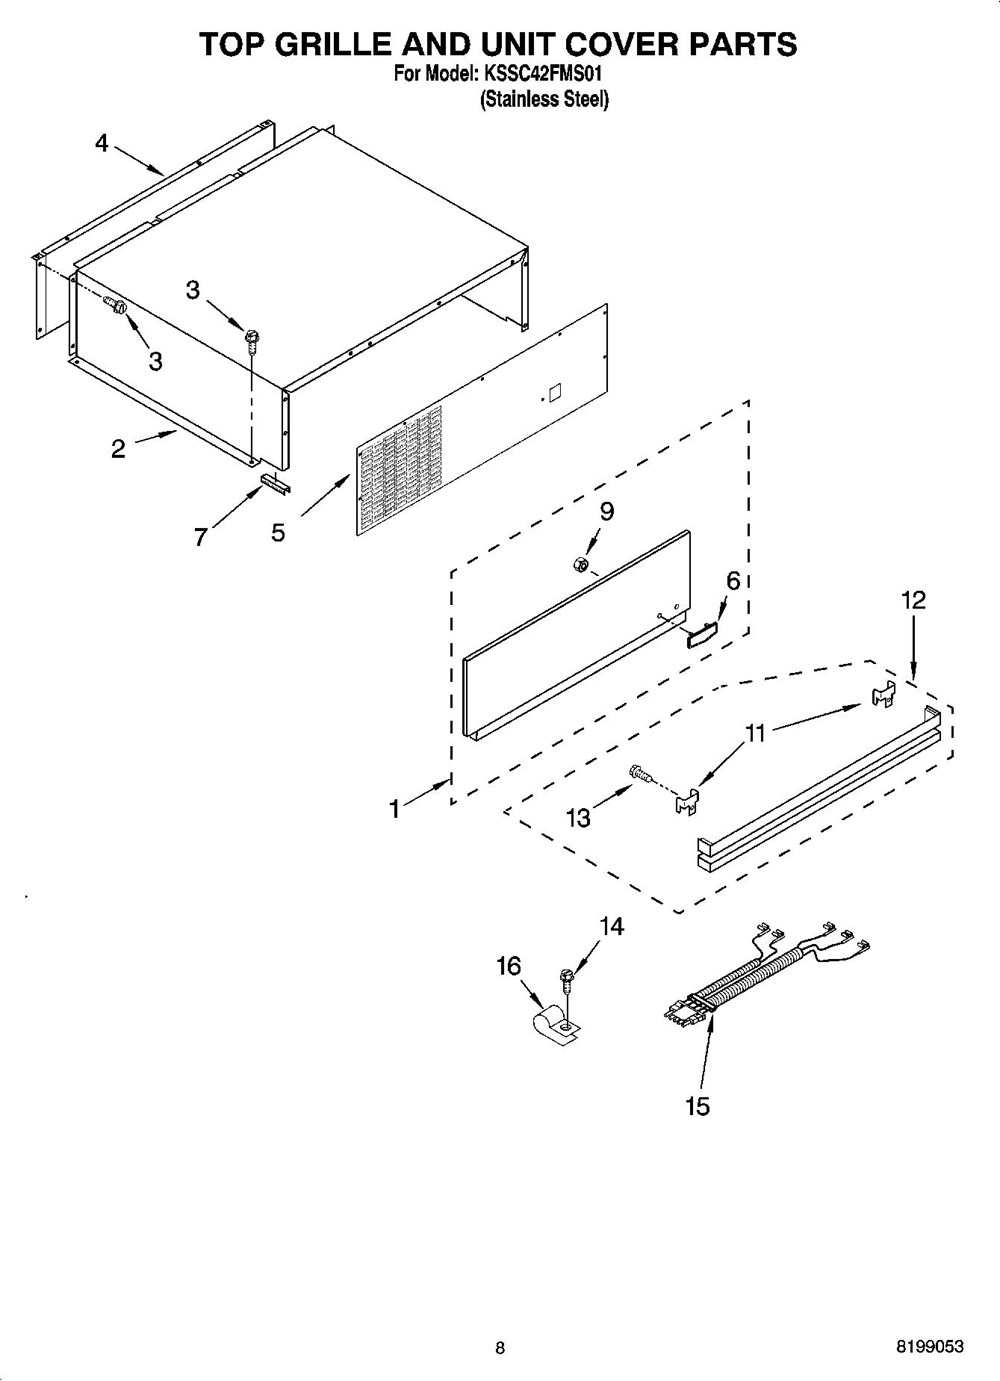 Kssc42fms01 Refrigerator 254 Cu Ft Architect Series Whirlpool Grill Wiring Diagram Kitchenaid Corporation